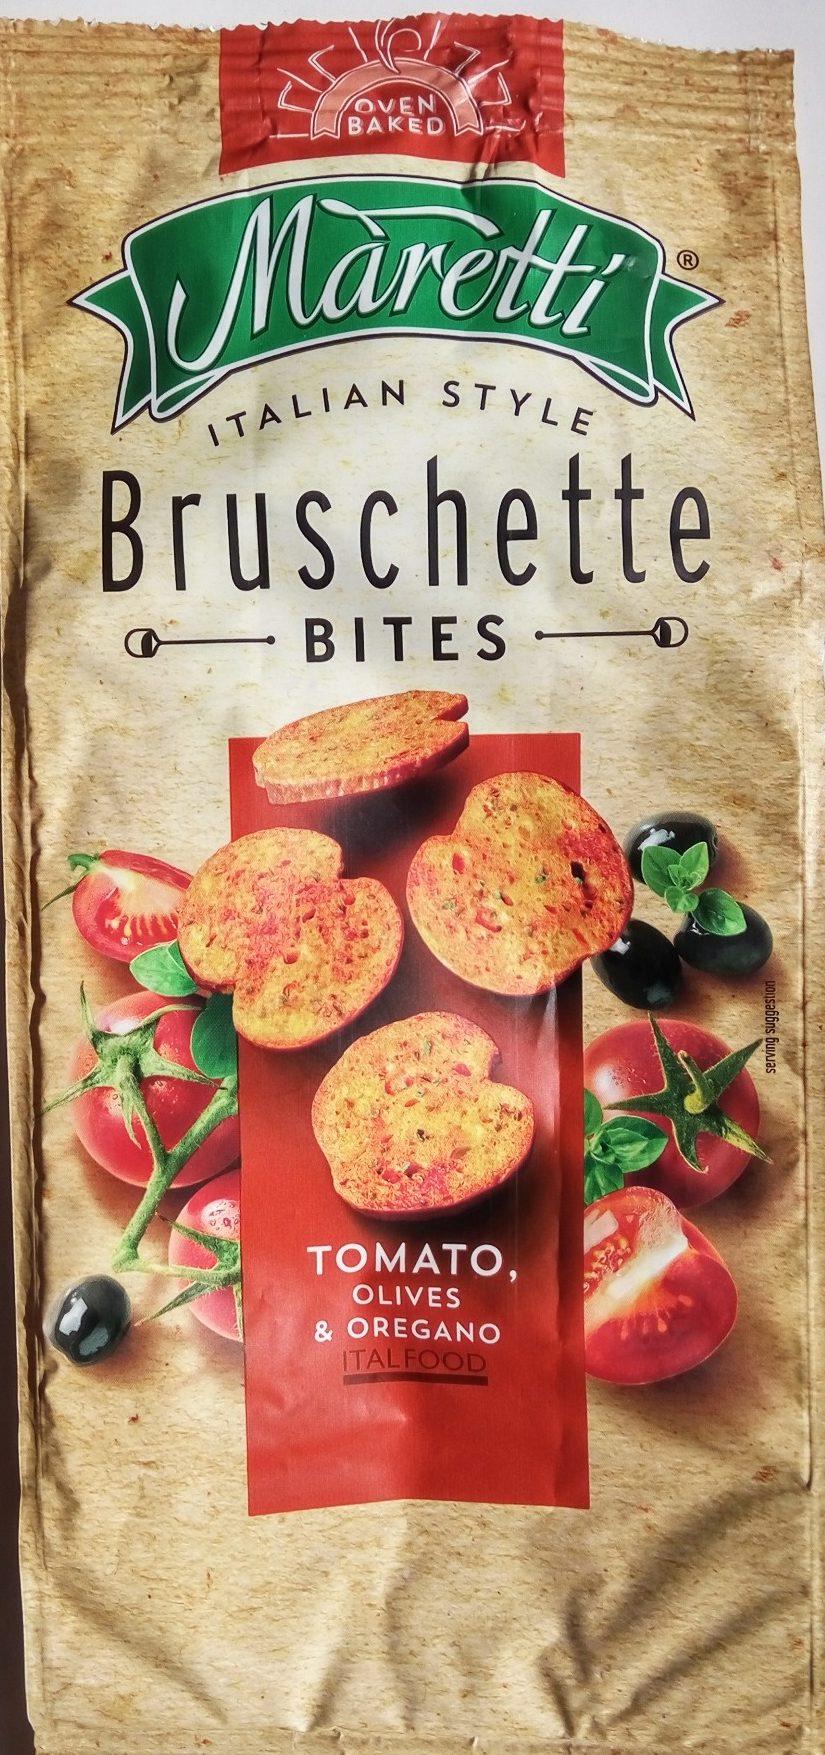 Bruschette chips paradicsommal olívával és oreganoval - Производ - sr